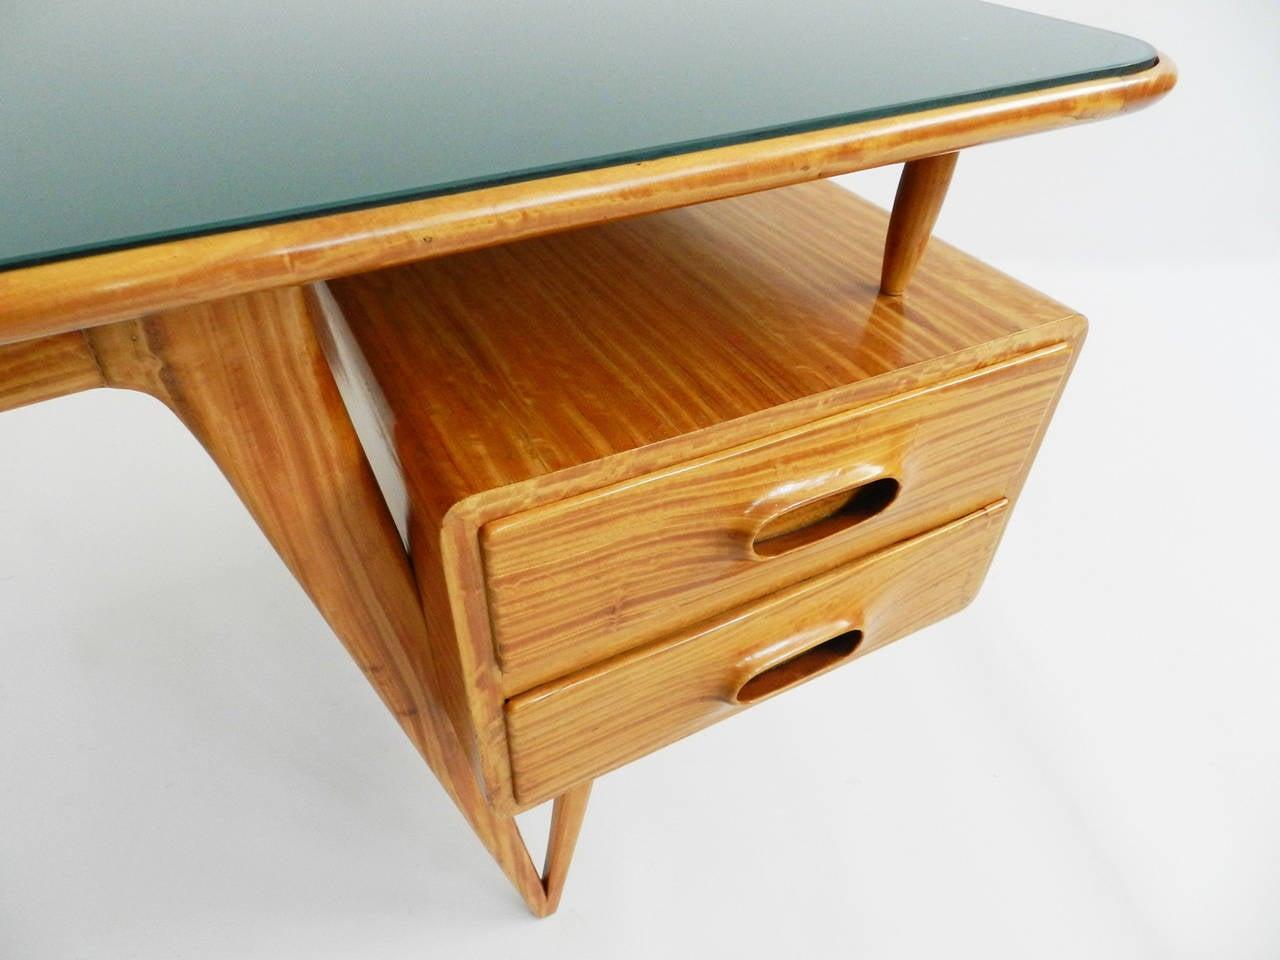 Lemon Wood Furniture ~ Super special small desk in lemon wood at stdibs